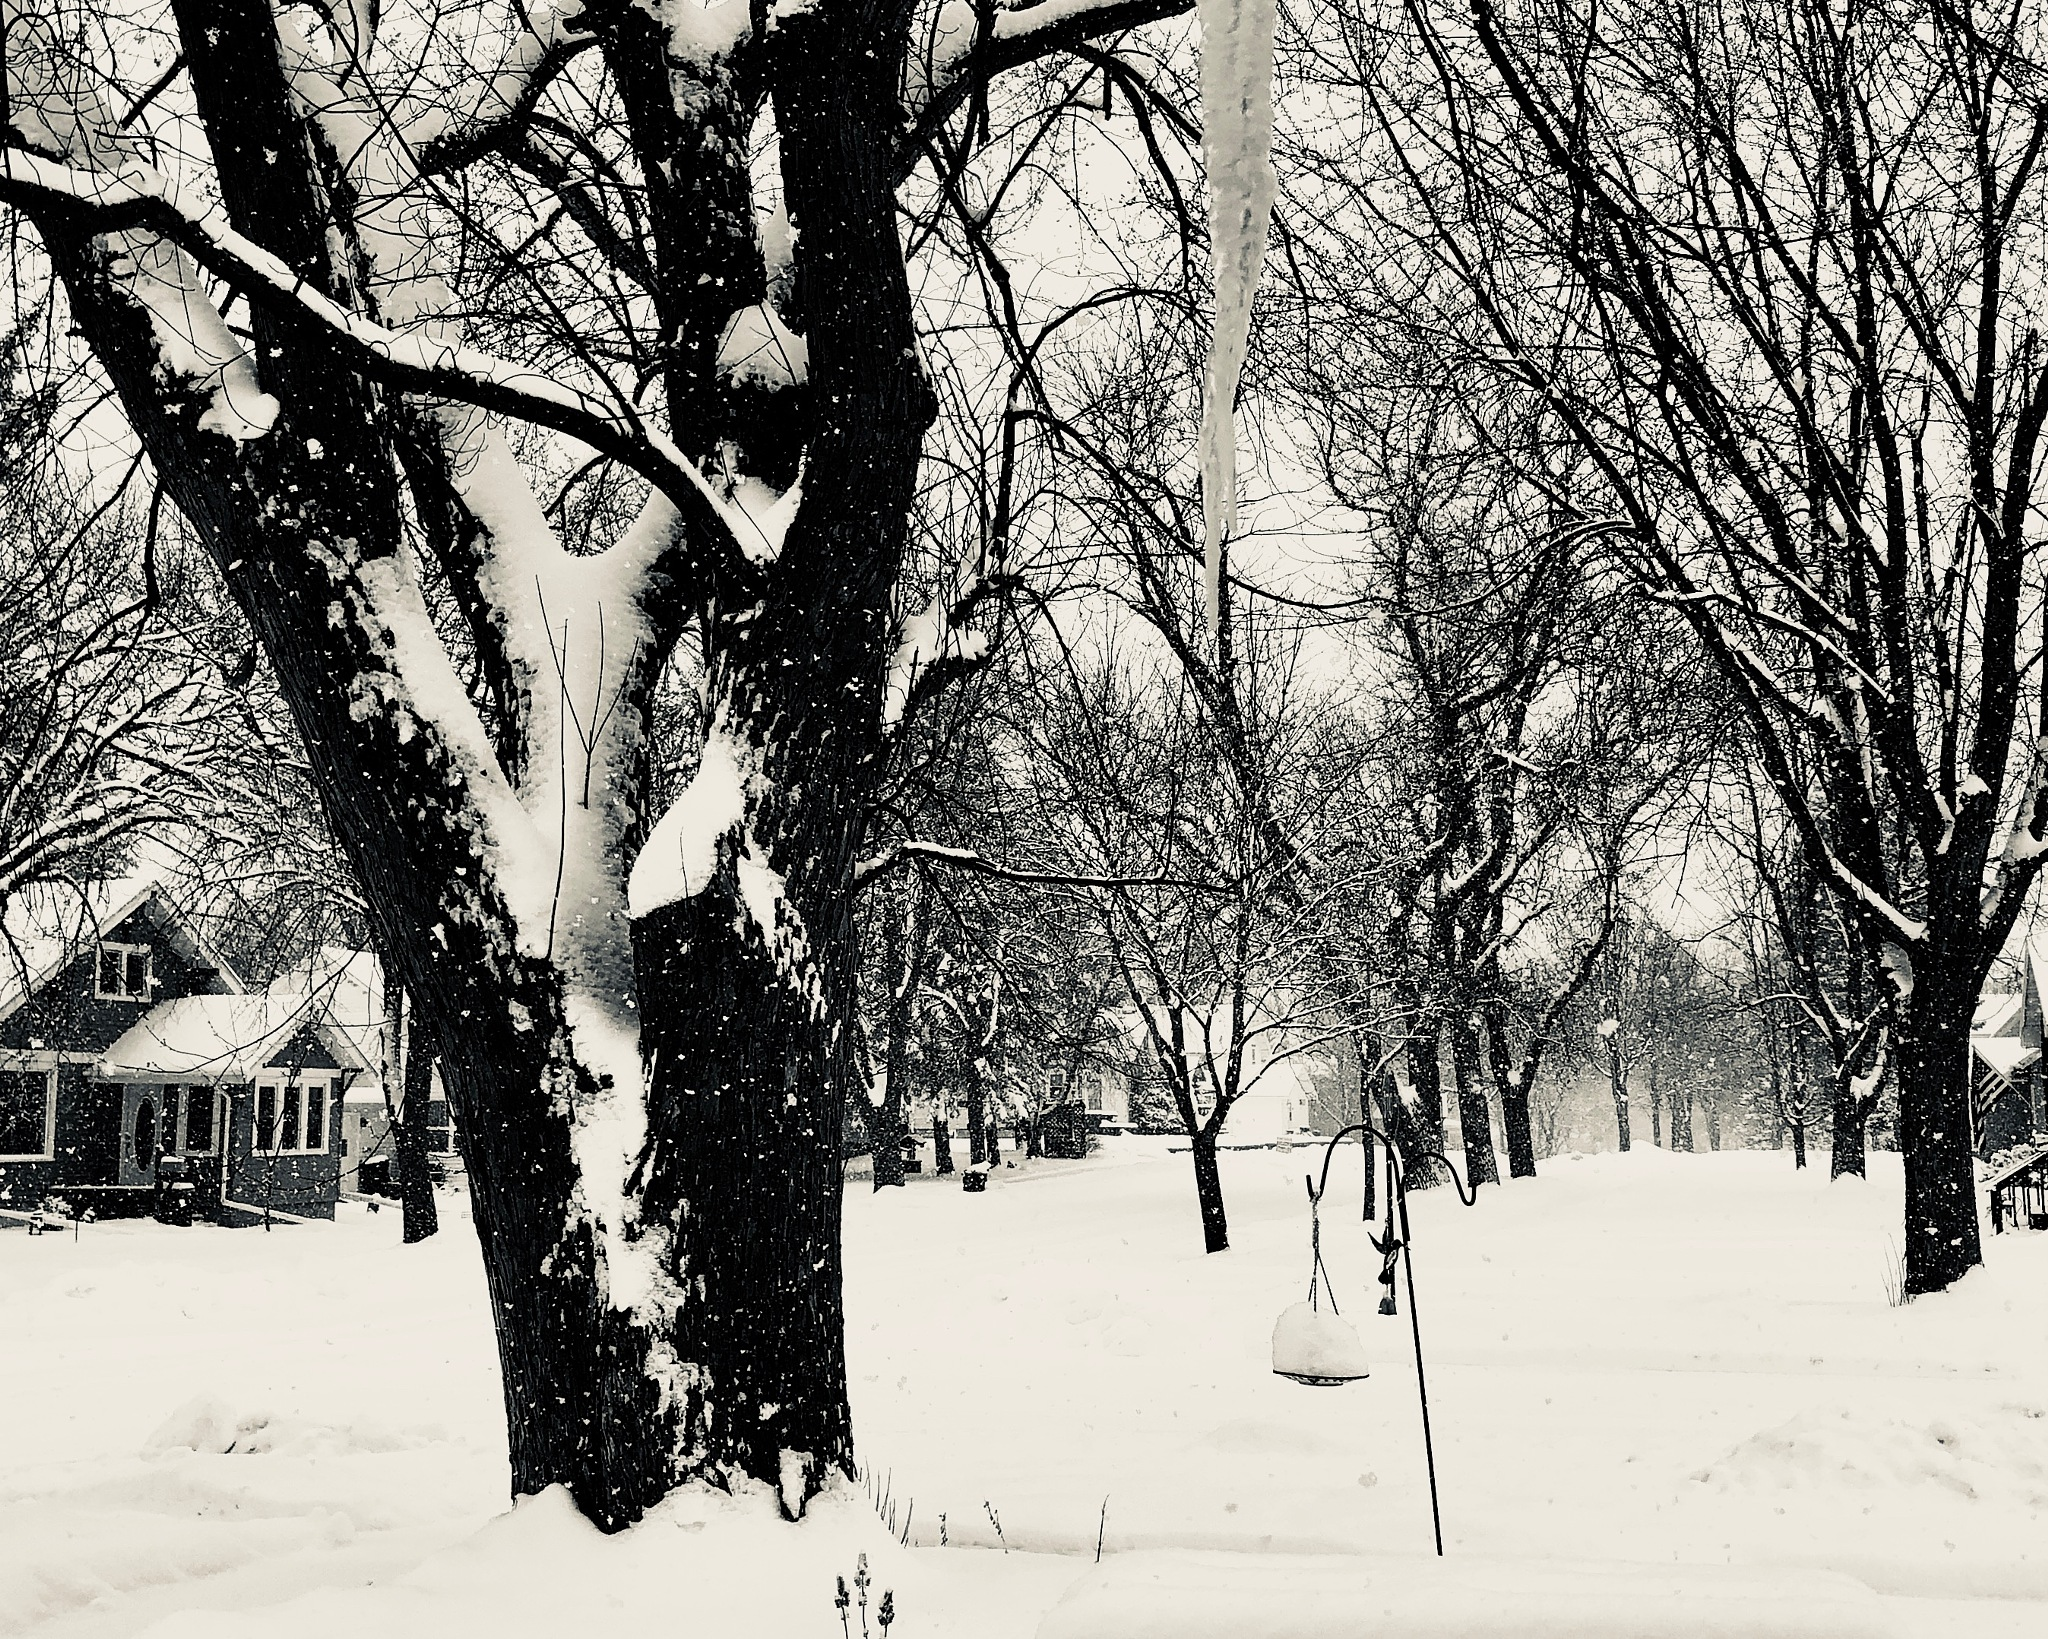 Mid afternoon Minnesota snowfall by ReneeEPlemmons